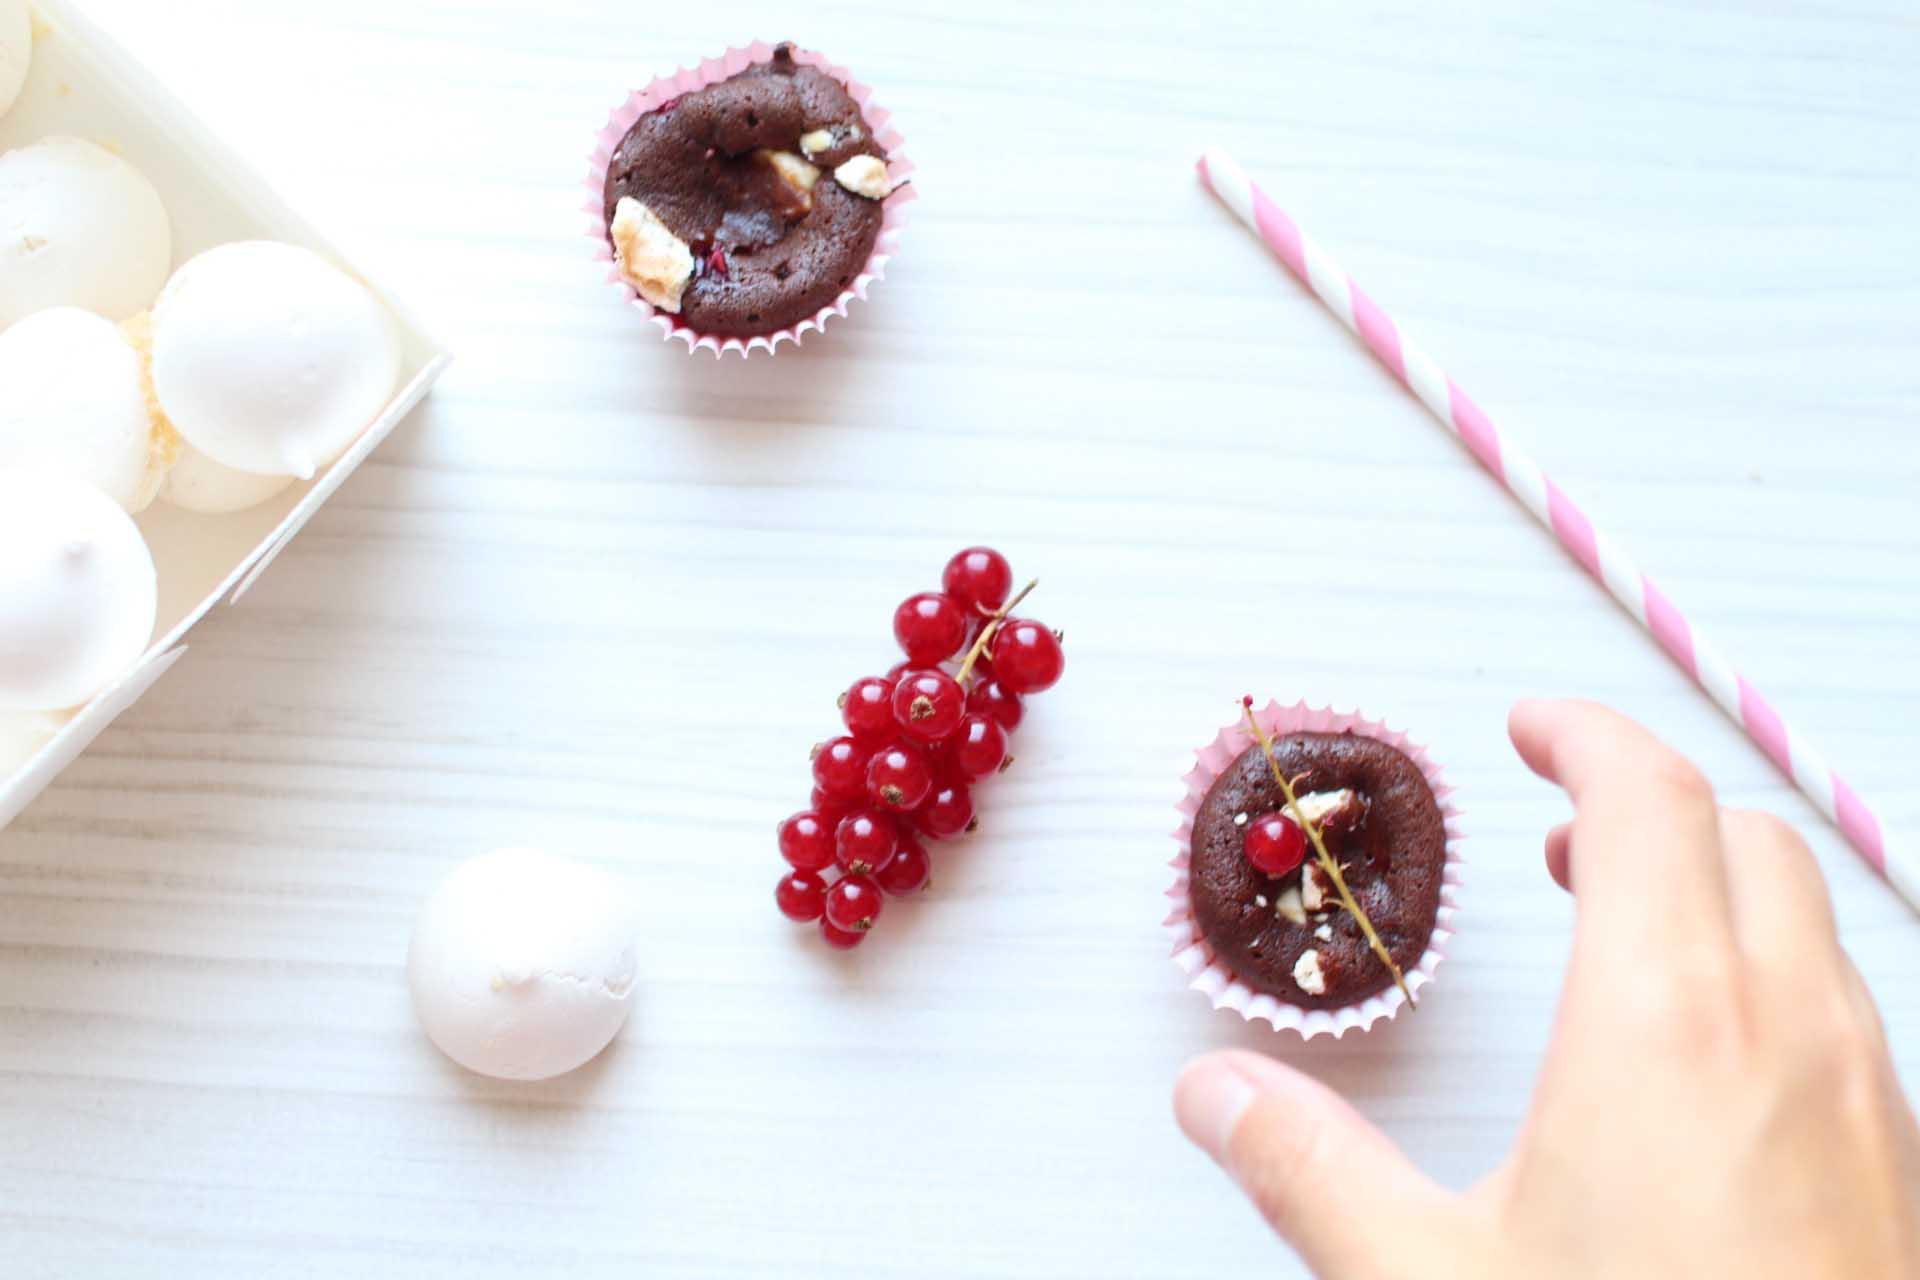 moelleux chocolat meringue groseilles